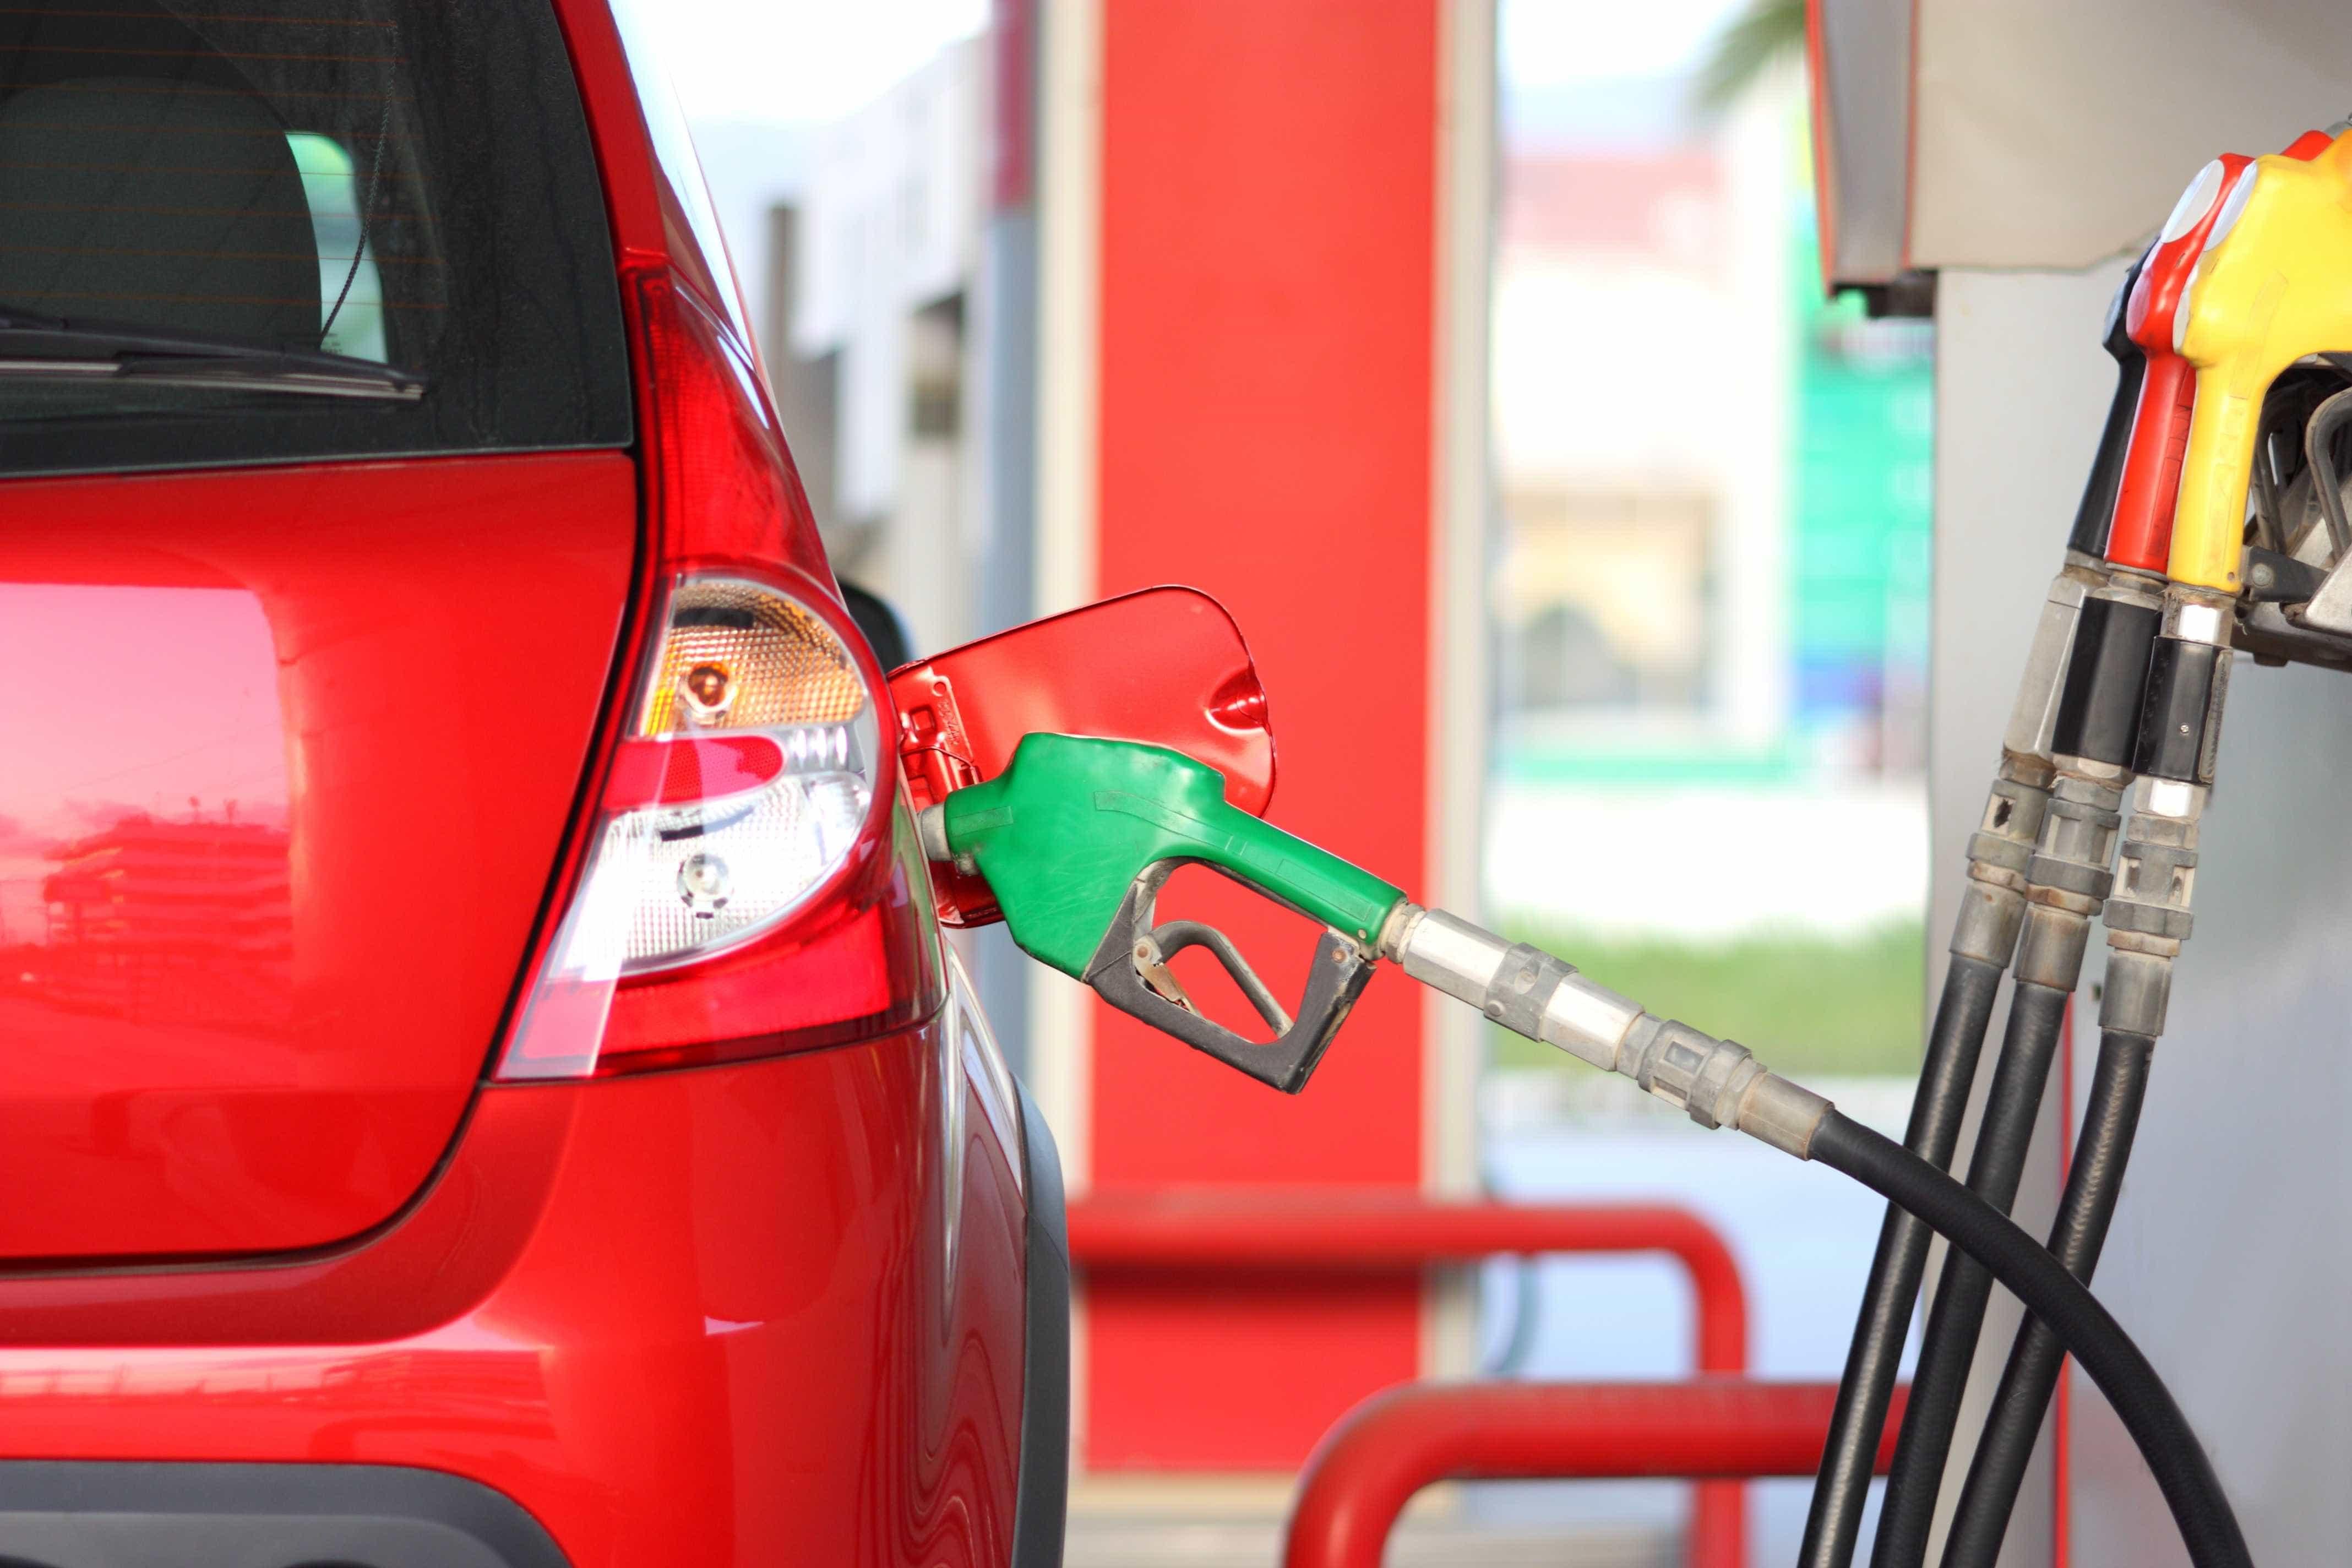 Combustíveis mais caros. Consulte onde custa menos abastecer